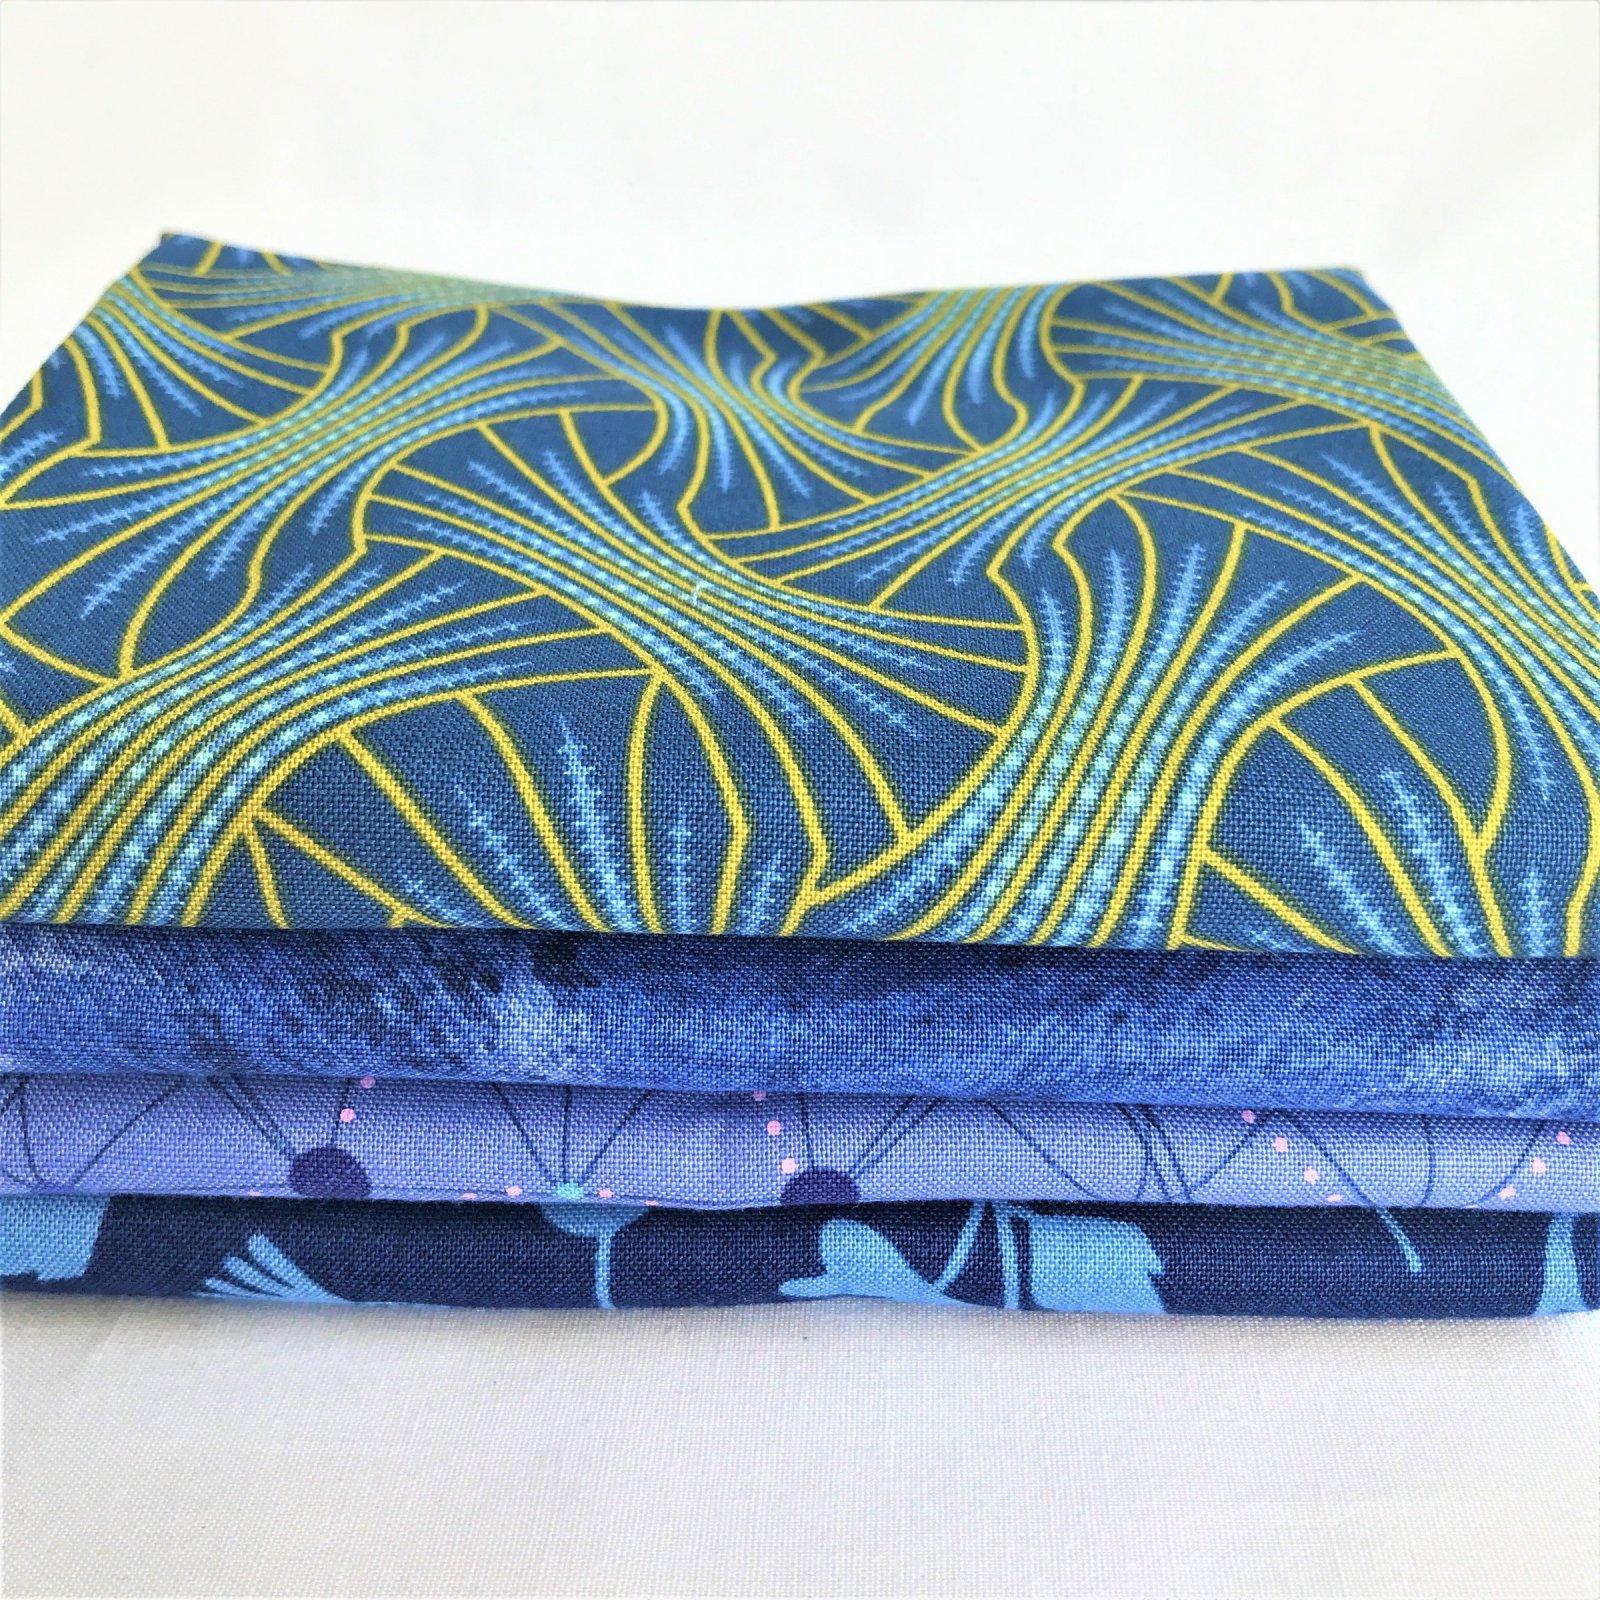 Boisterous Blue 4-fabric bundle